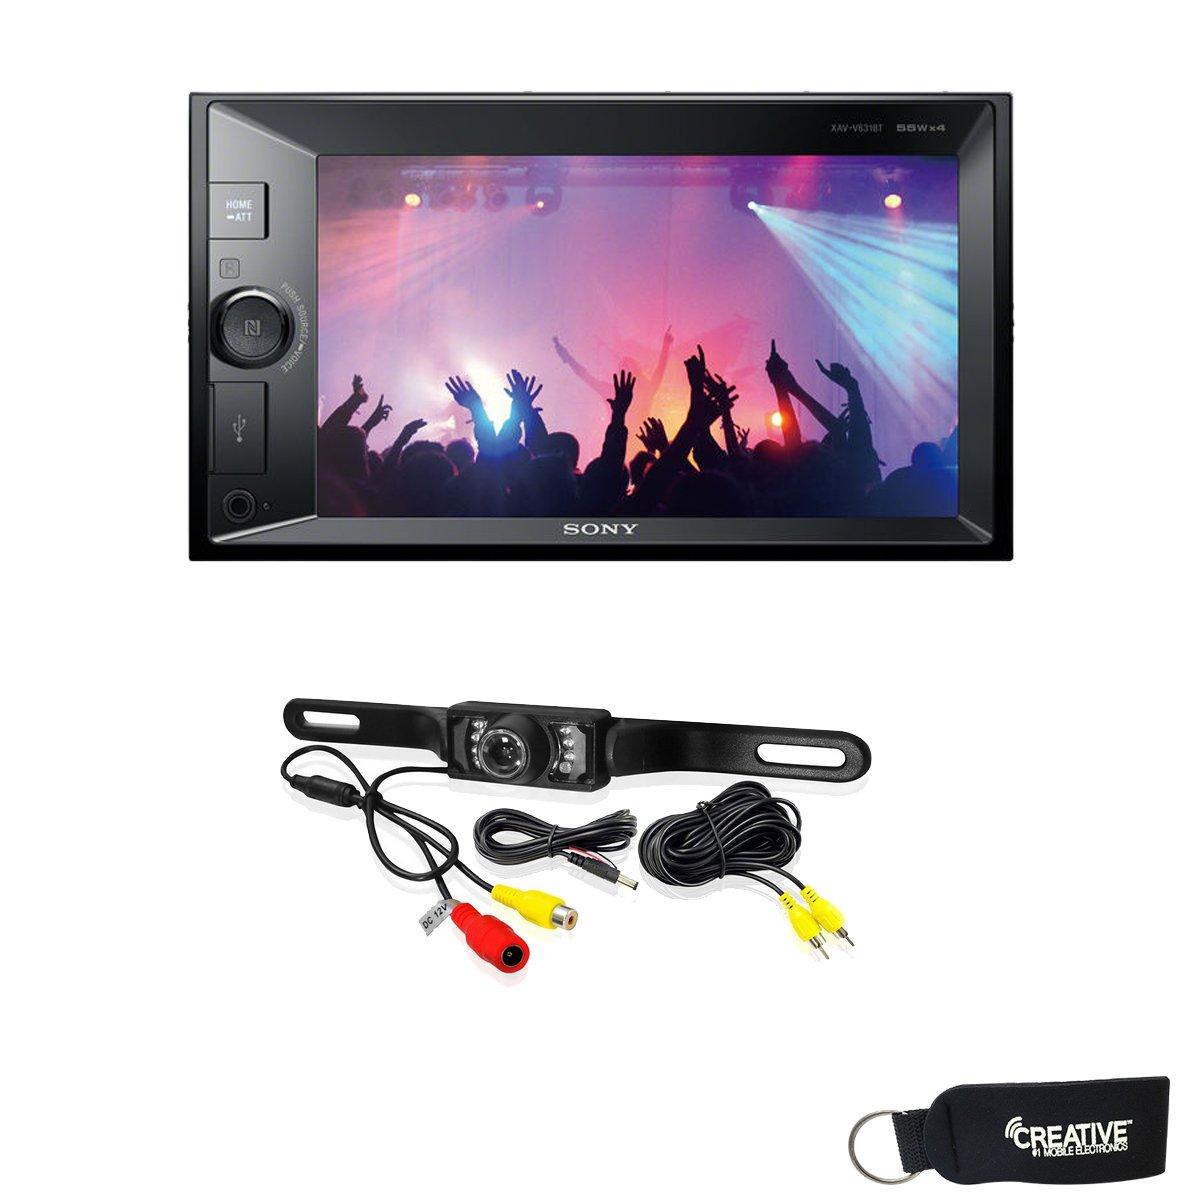 Sony XAV-V631BT Digital Media Receiver with Bluetooth and Back Up Camera